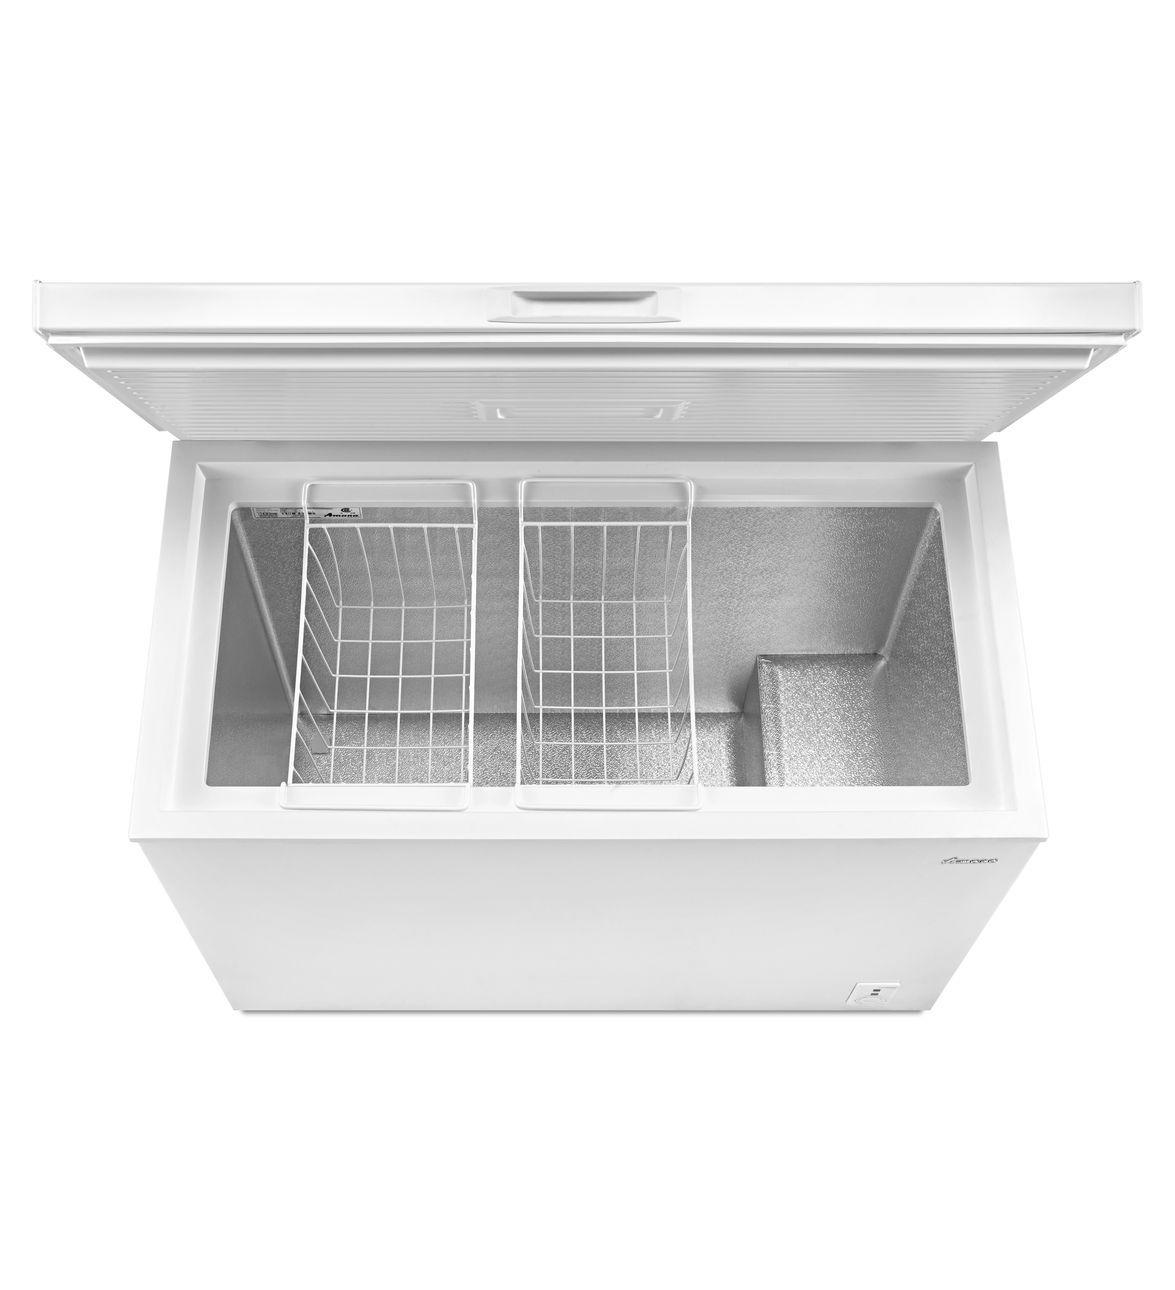 Aqc0902drw Amana 174 9 0 Cu Ft Compact Chest Freezer